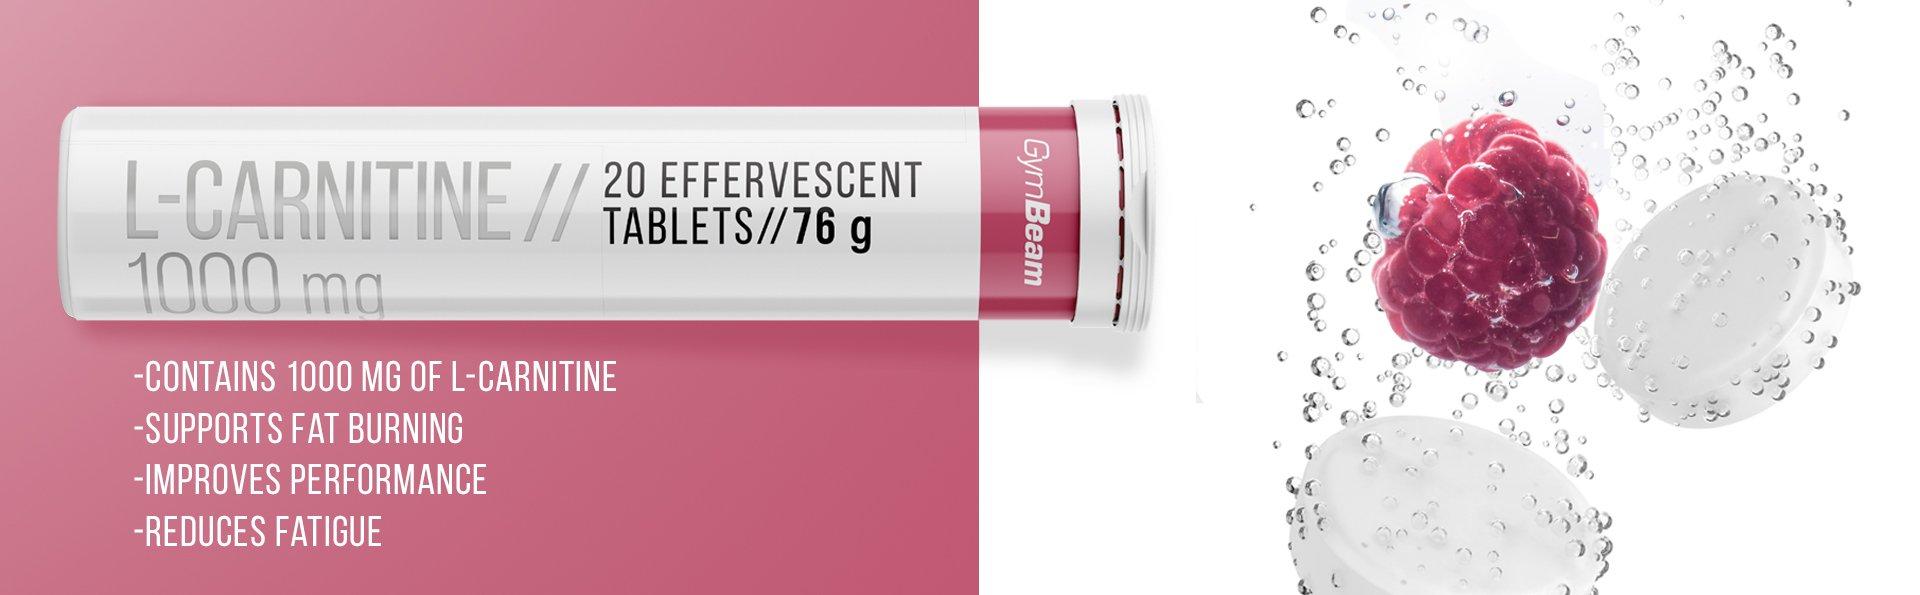 L-Karnitin 1000 mg - GymBeam - 20 tabs